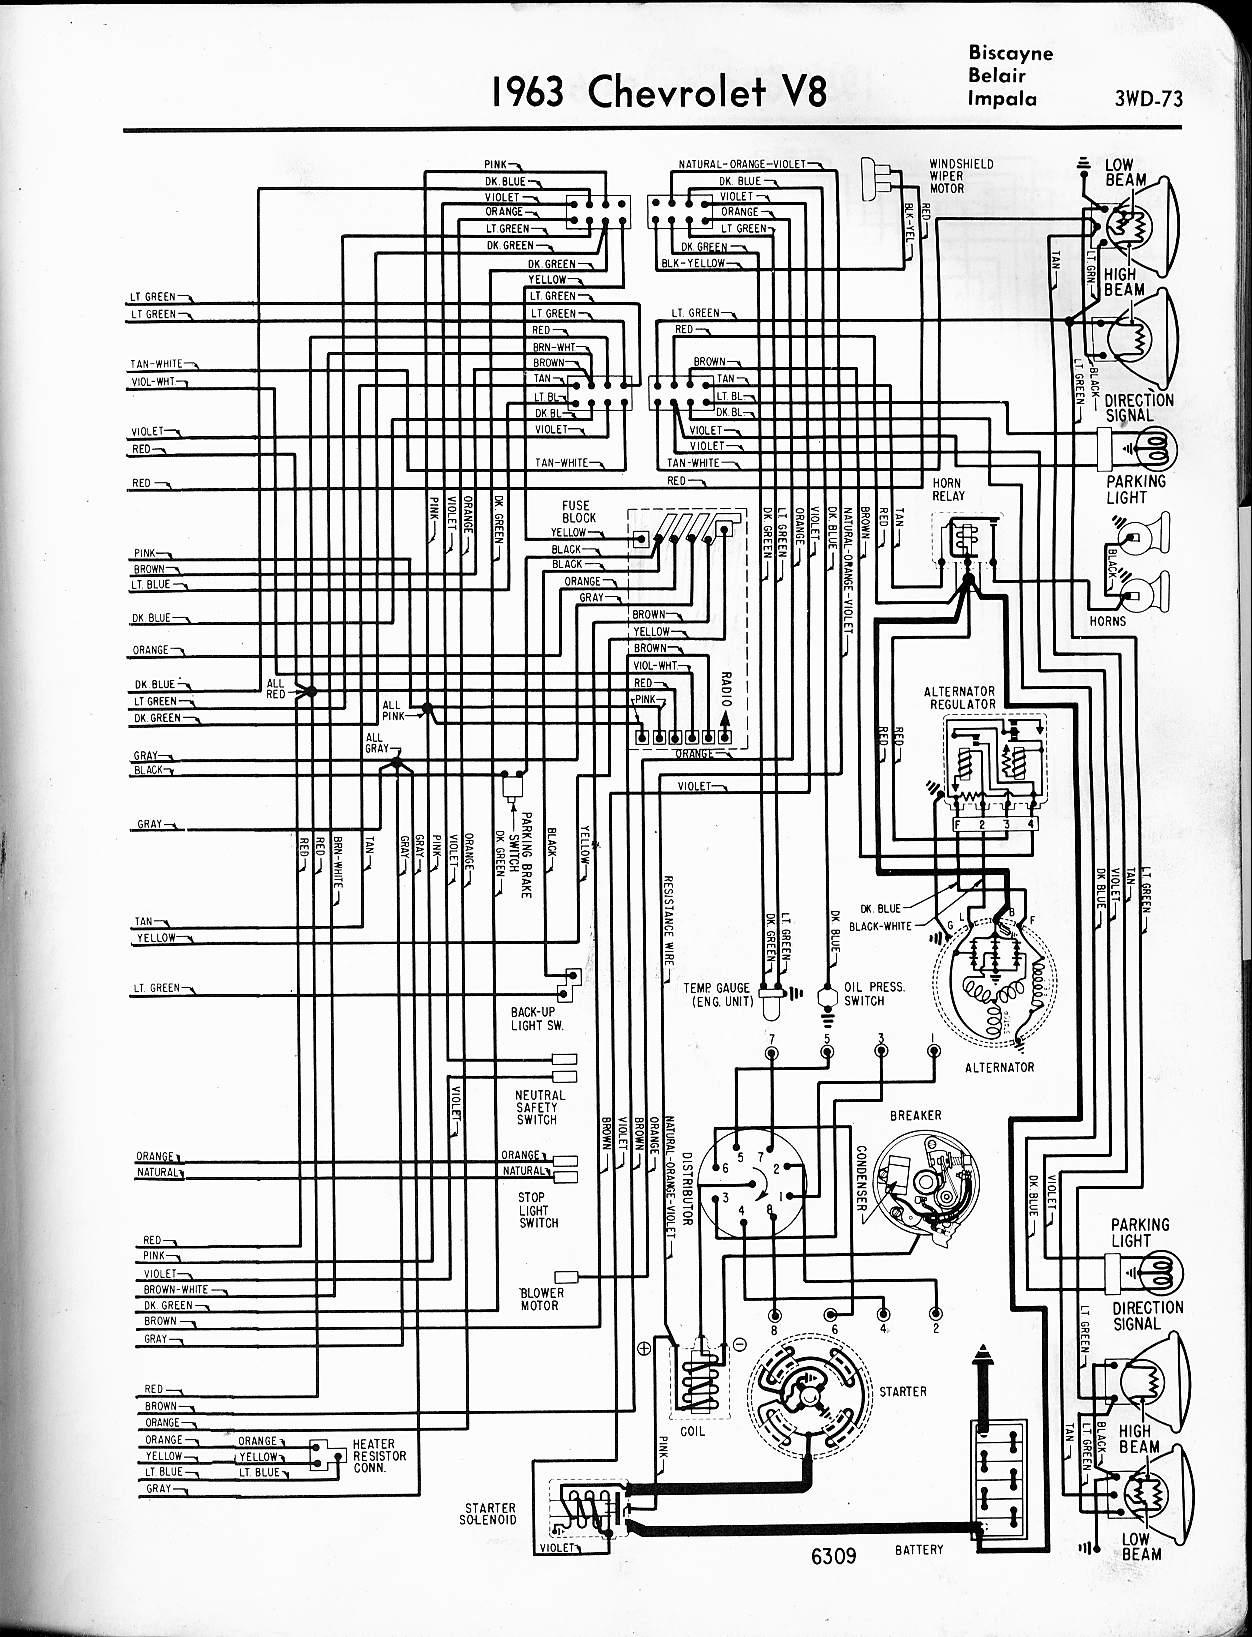 MWireChev64_3WD 073?resize=665%2C869 1964 impala headlight wiring diagram wiring diagram  at readyjetset.co